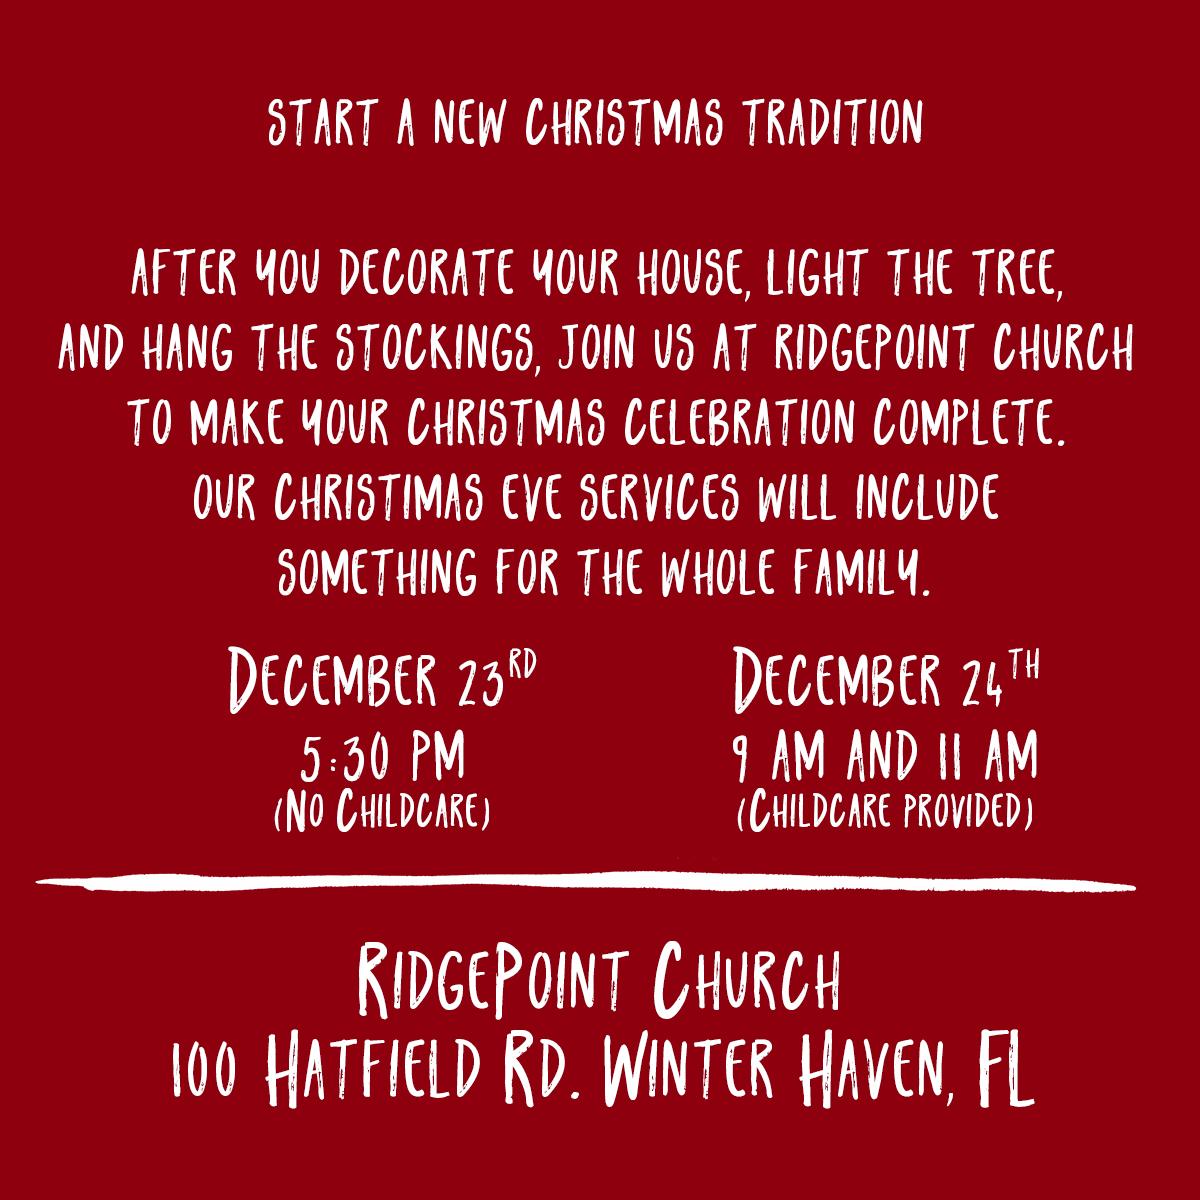 Christmas on Hatfield Description